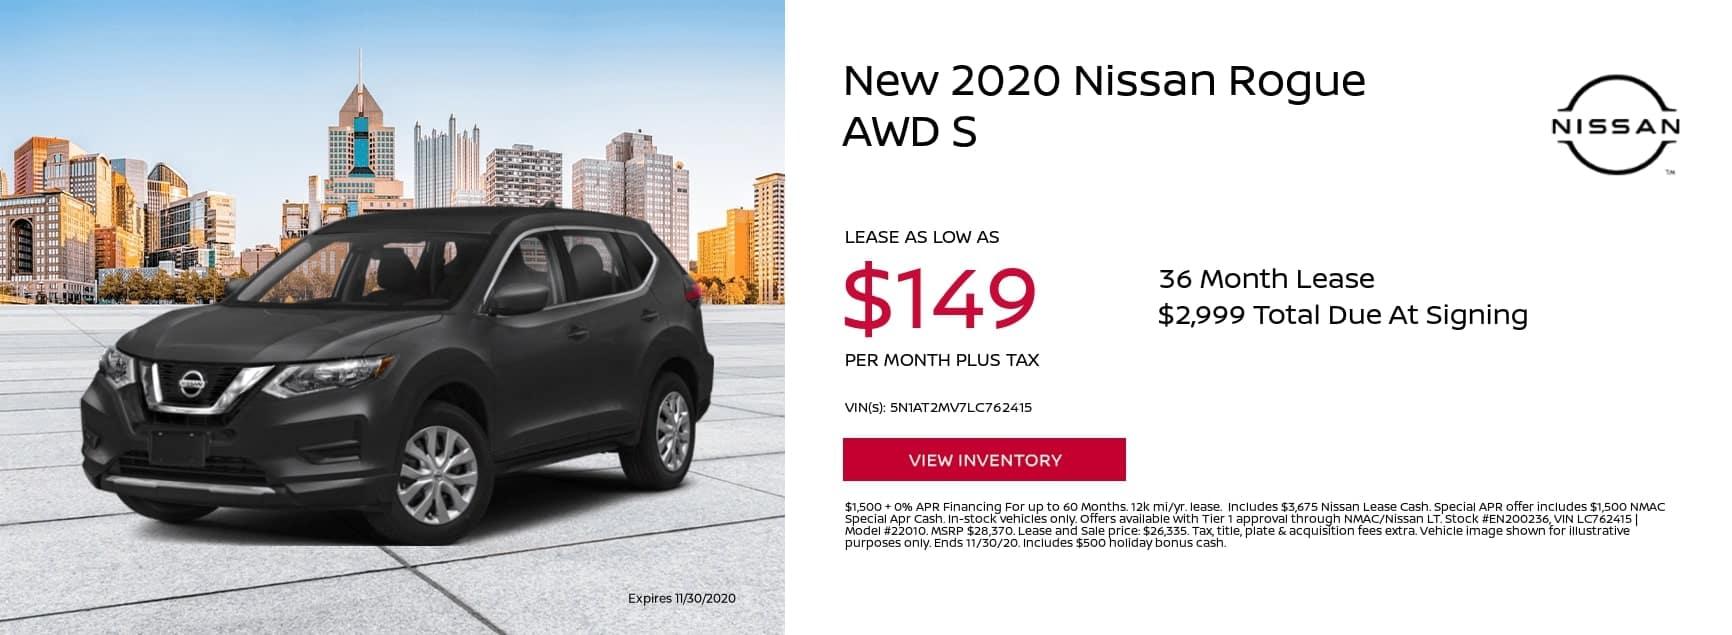 2020-Nissan-Rogue-AWD-S-83